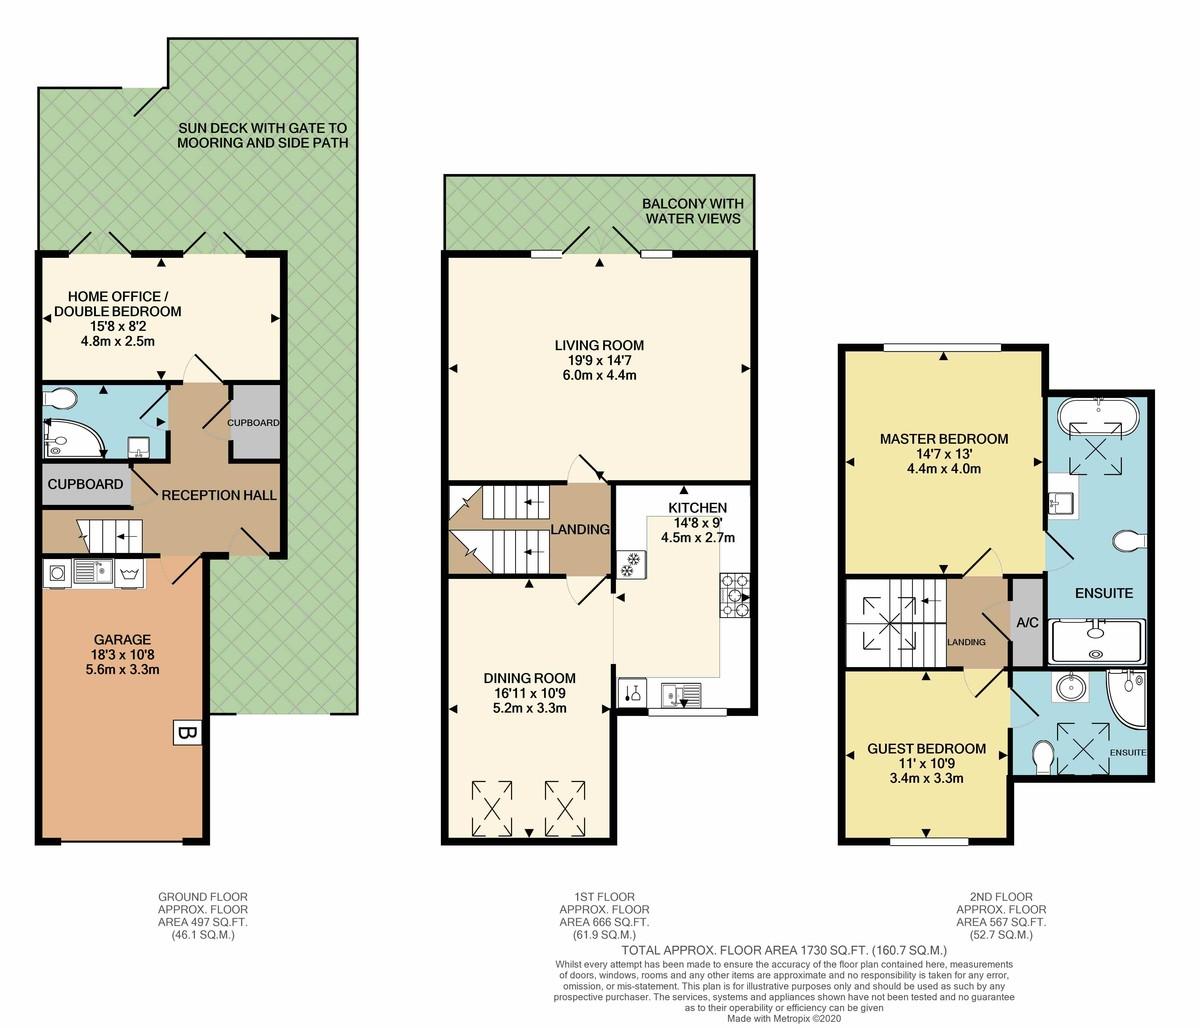 White Heather Court, Hythe Marina Village, Southampton floorplan